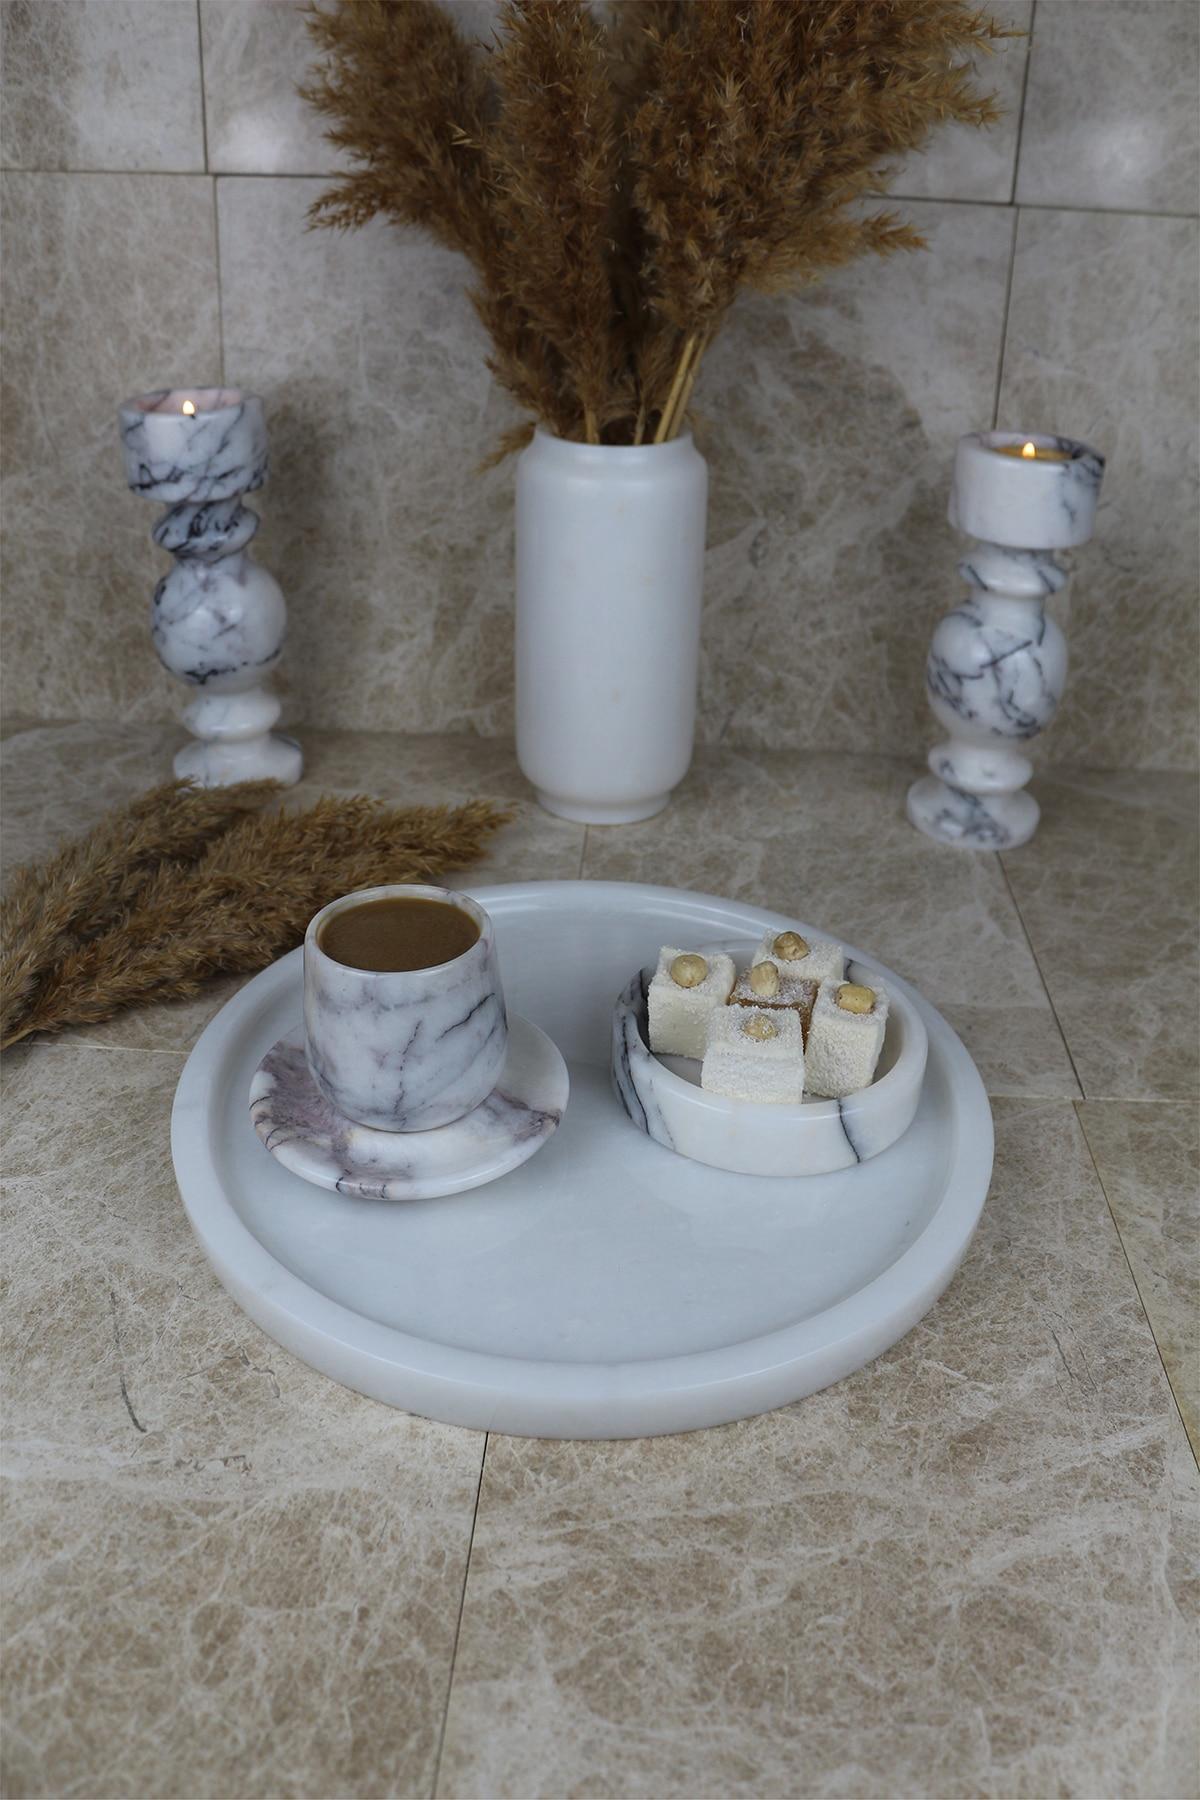 İskandinav 28cm white real natural marble tray bathroom storage round jewelry box kitchen dish dispenser luxury Tiss enlarge